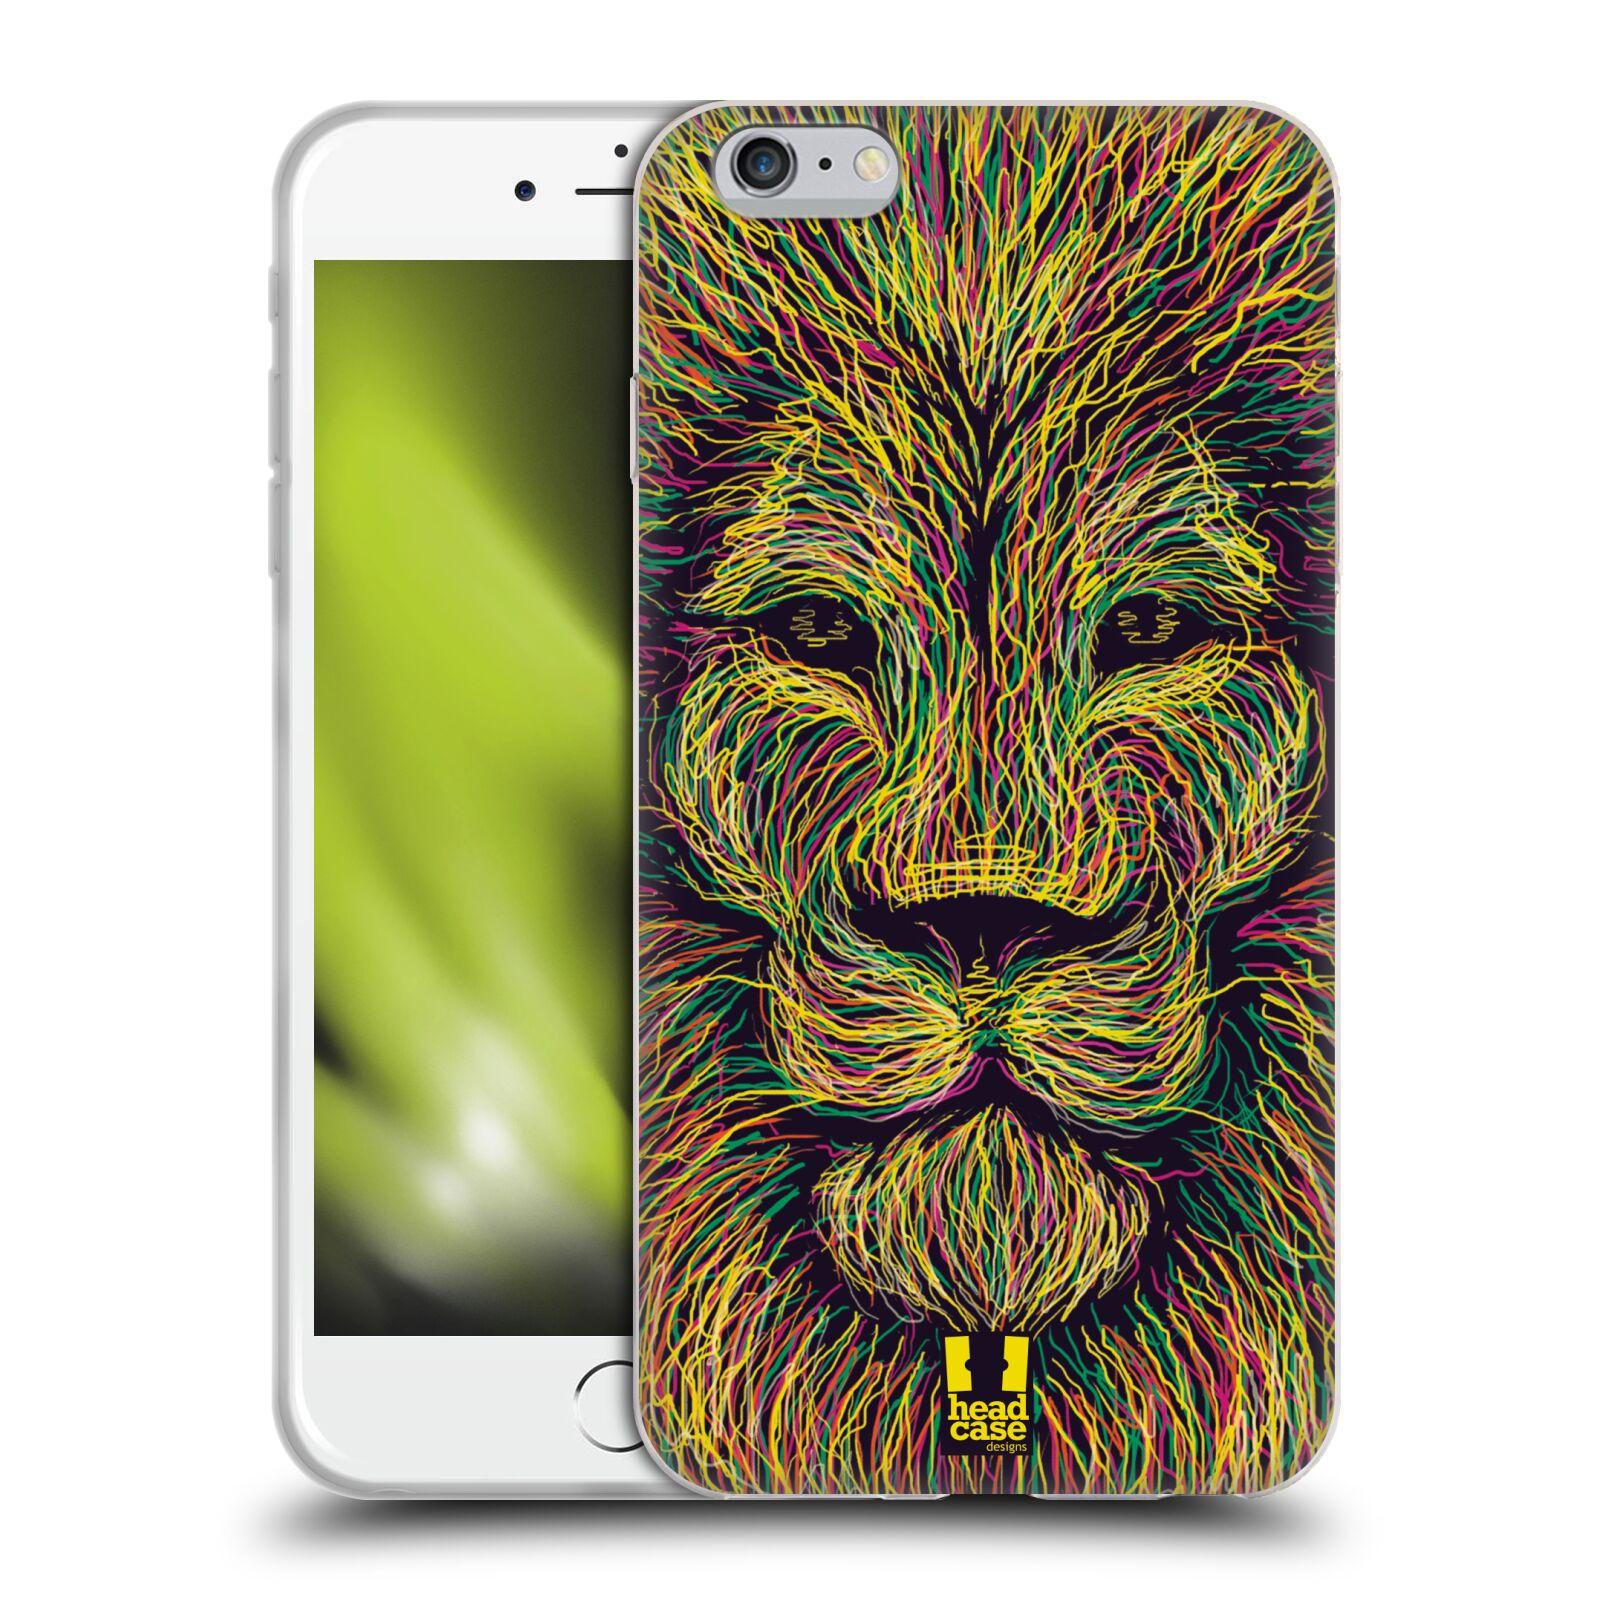 HEAD CASE silikonový obal na mobil Apple Iphone 6 PLUS/ 6S PLUS vzor zvíře čmáranice lev